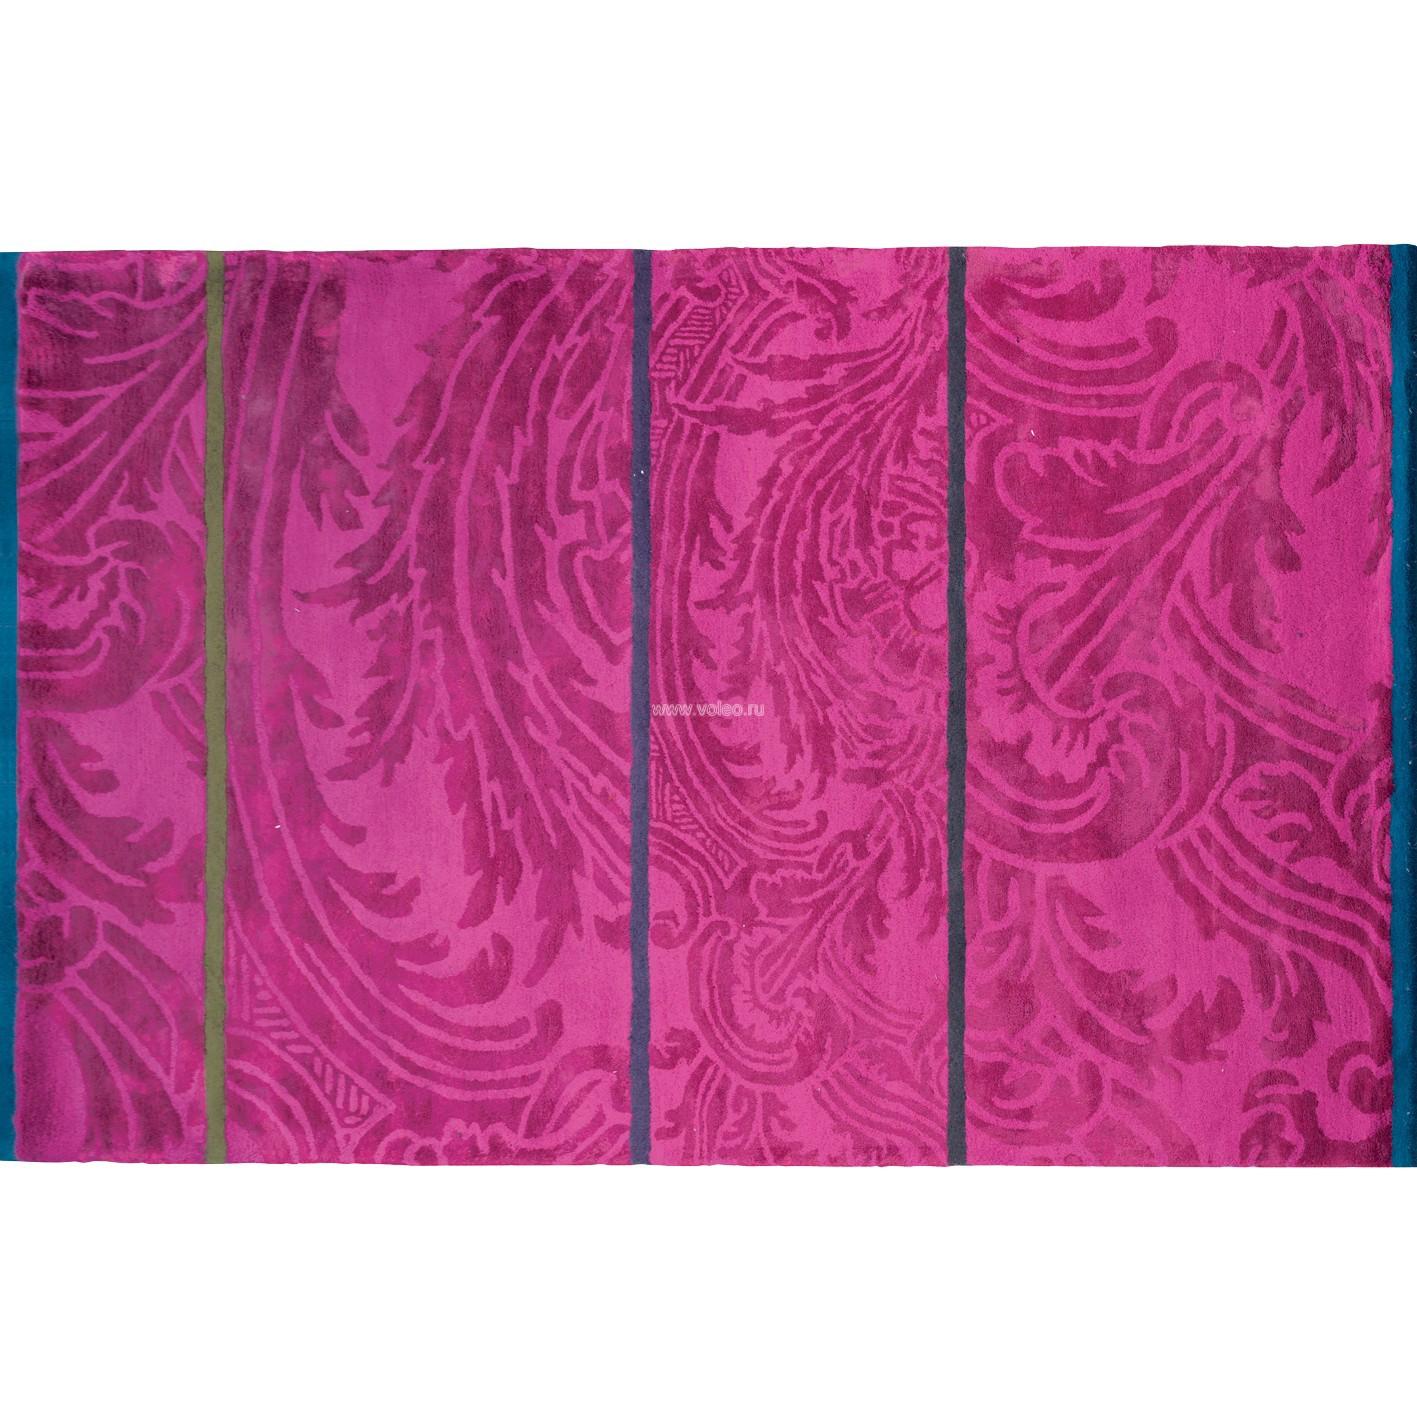 Ковер Designers Guild Rugs Constantinople Fuchsia DHRDG0071, интернет магазин Волео